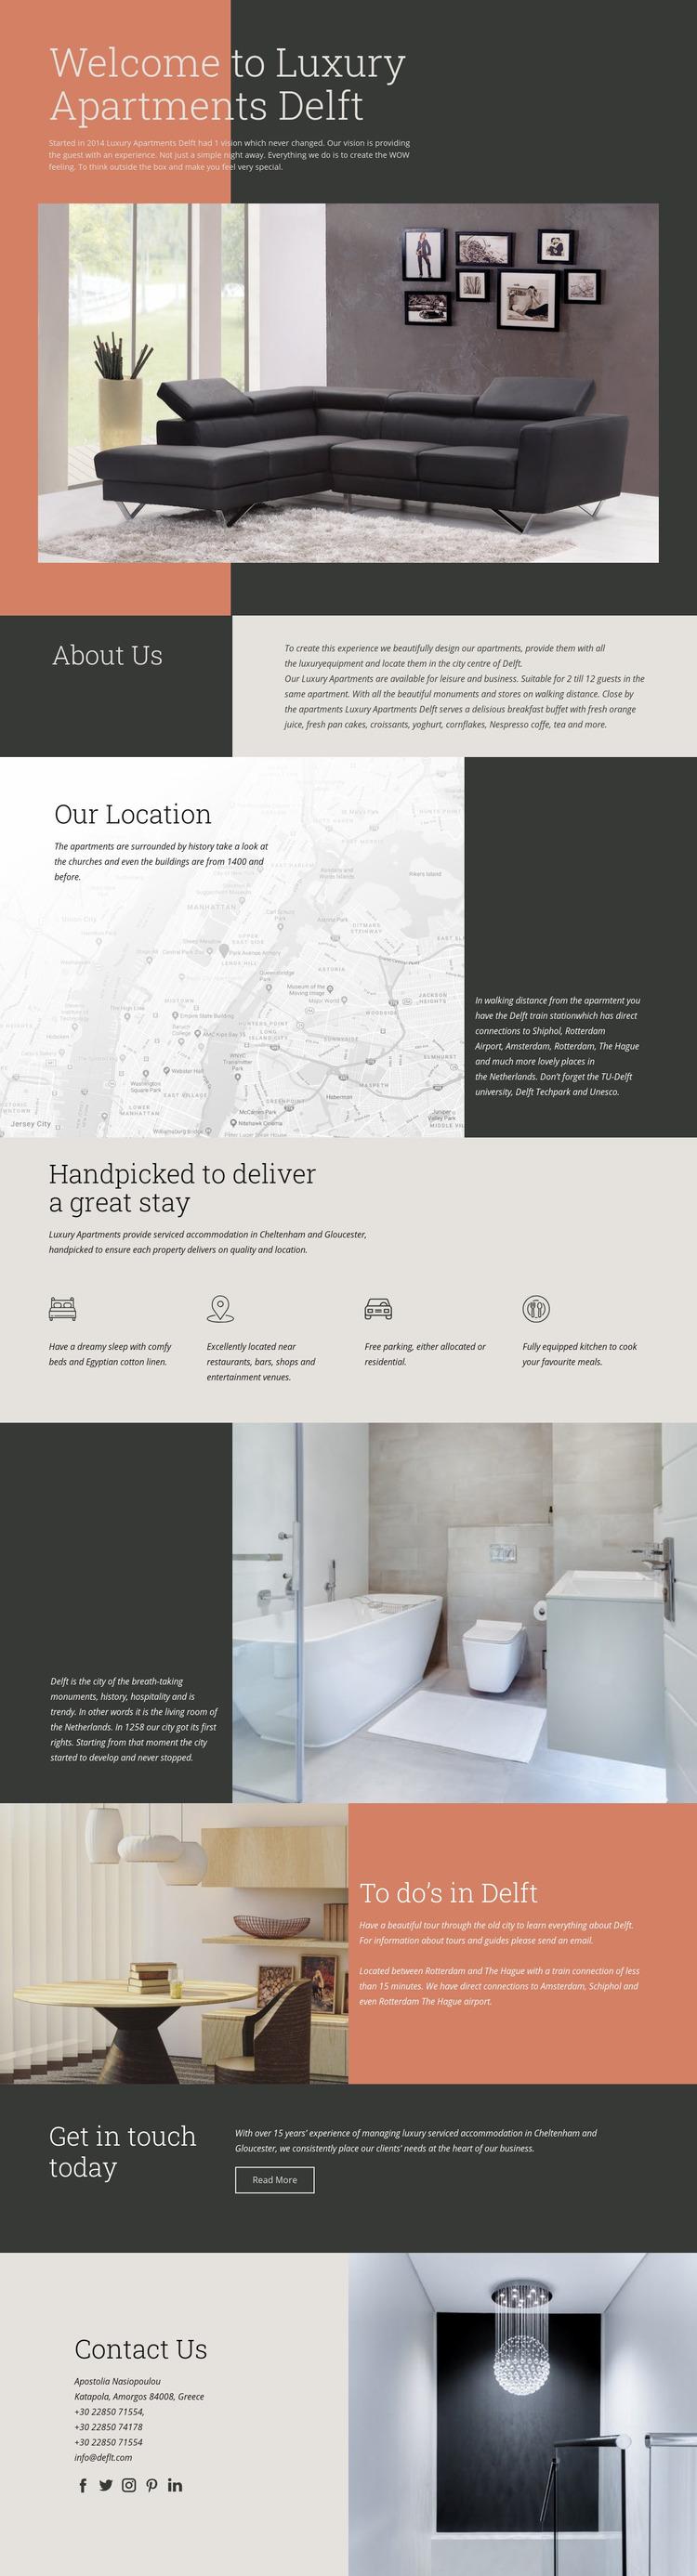 Luxury Apartments Website Maker